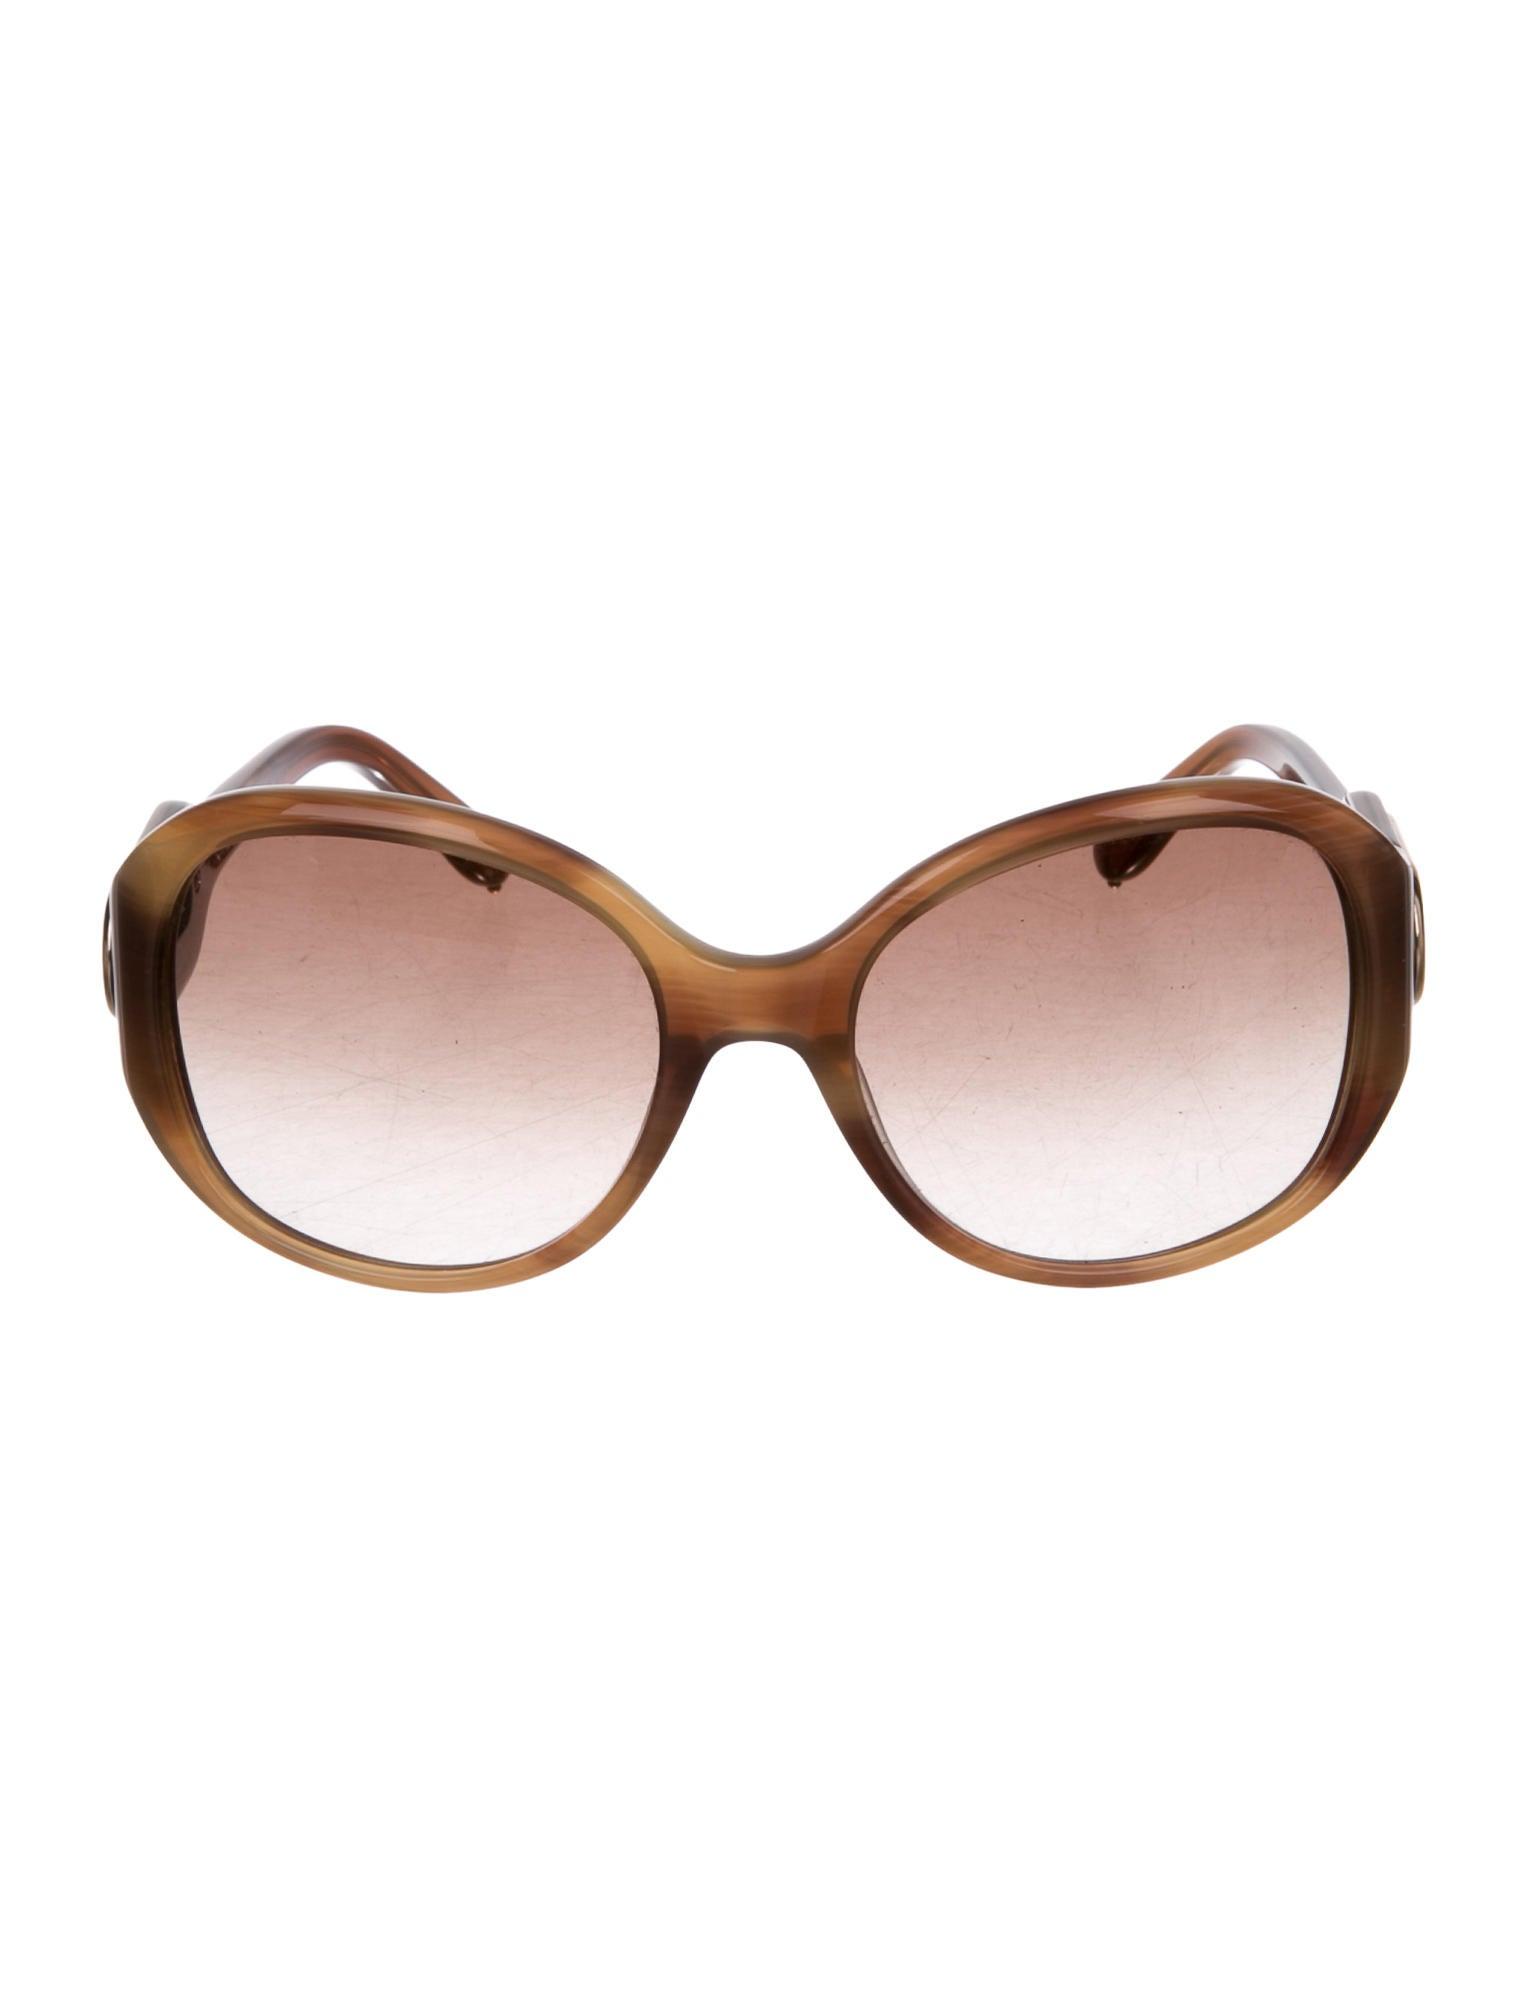 7163293eb7f5 Women · Accessories  Chloé Oversize Gradient Sunglasses. Oversize Gradient  Sunglasses